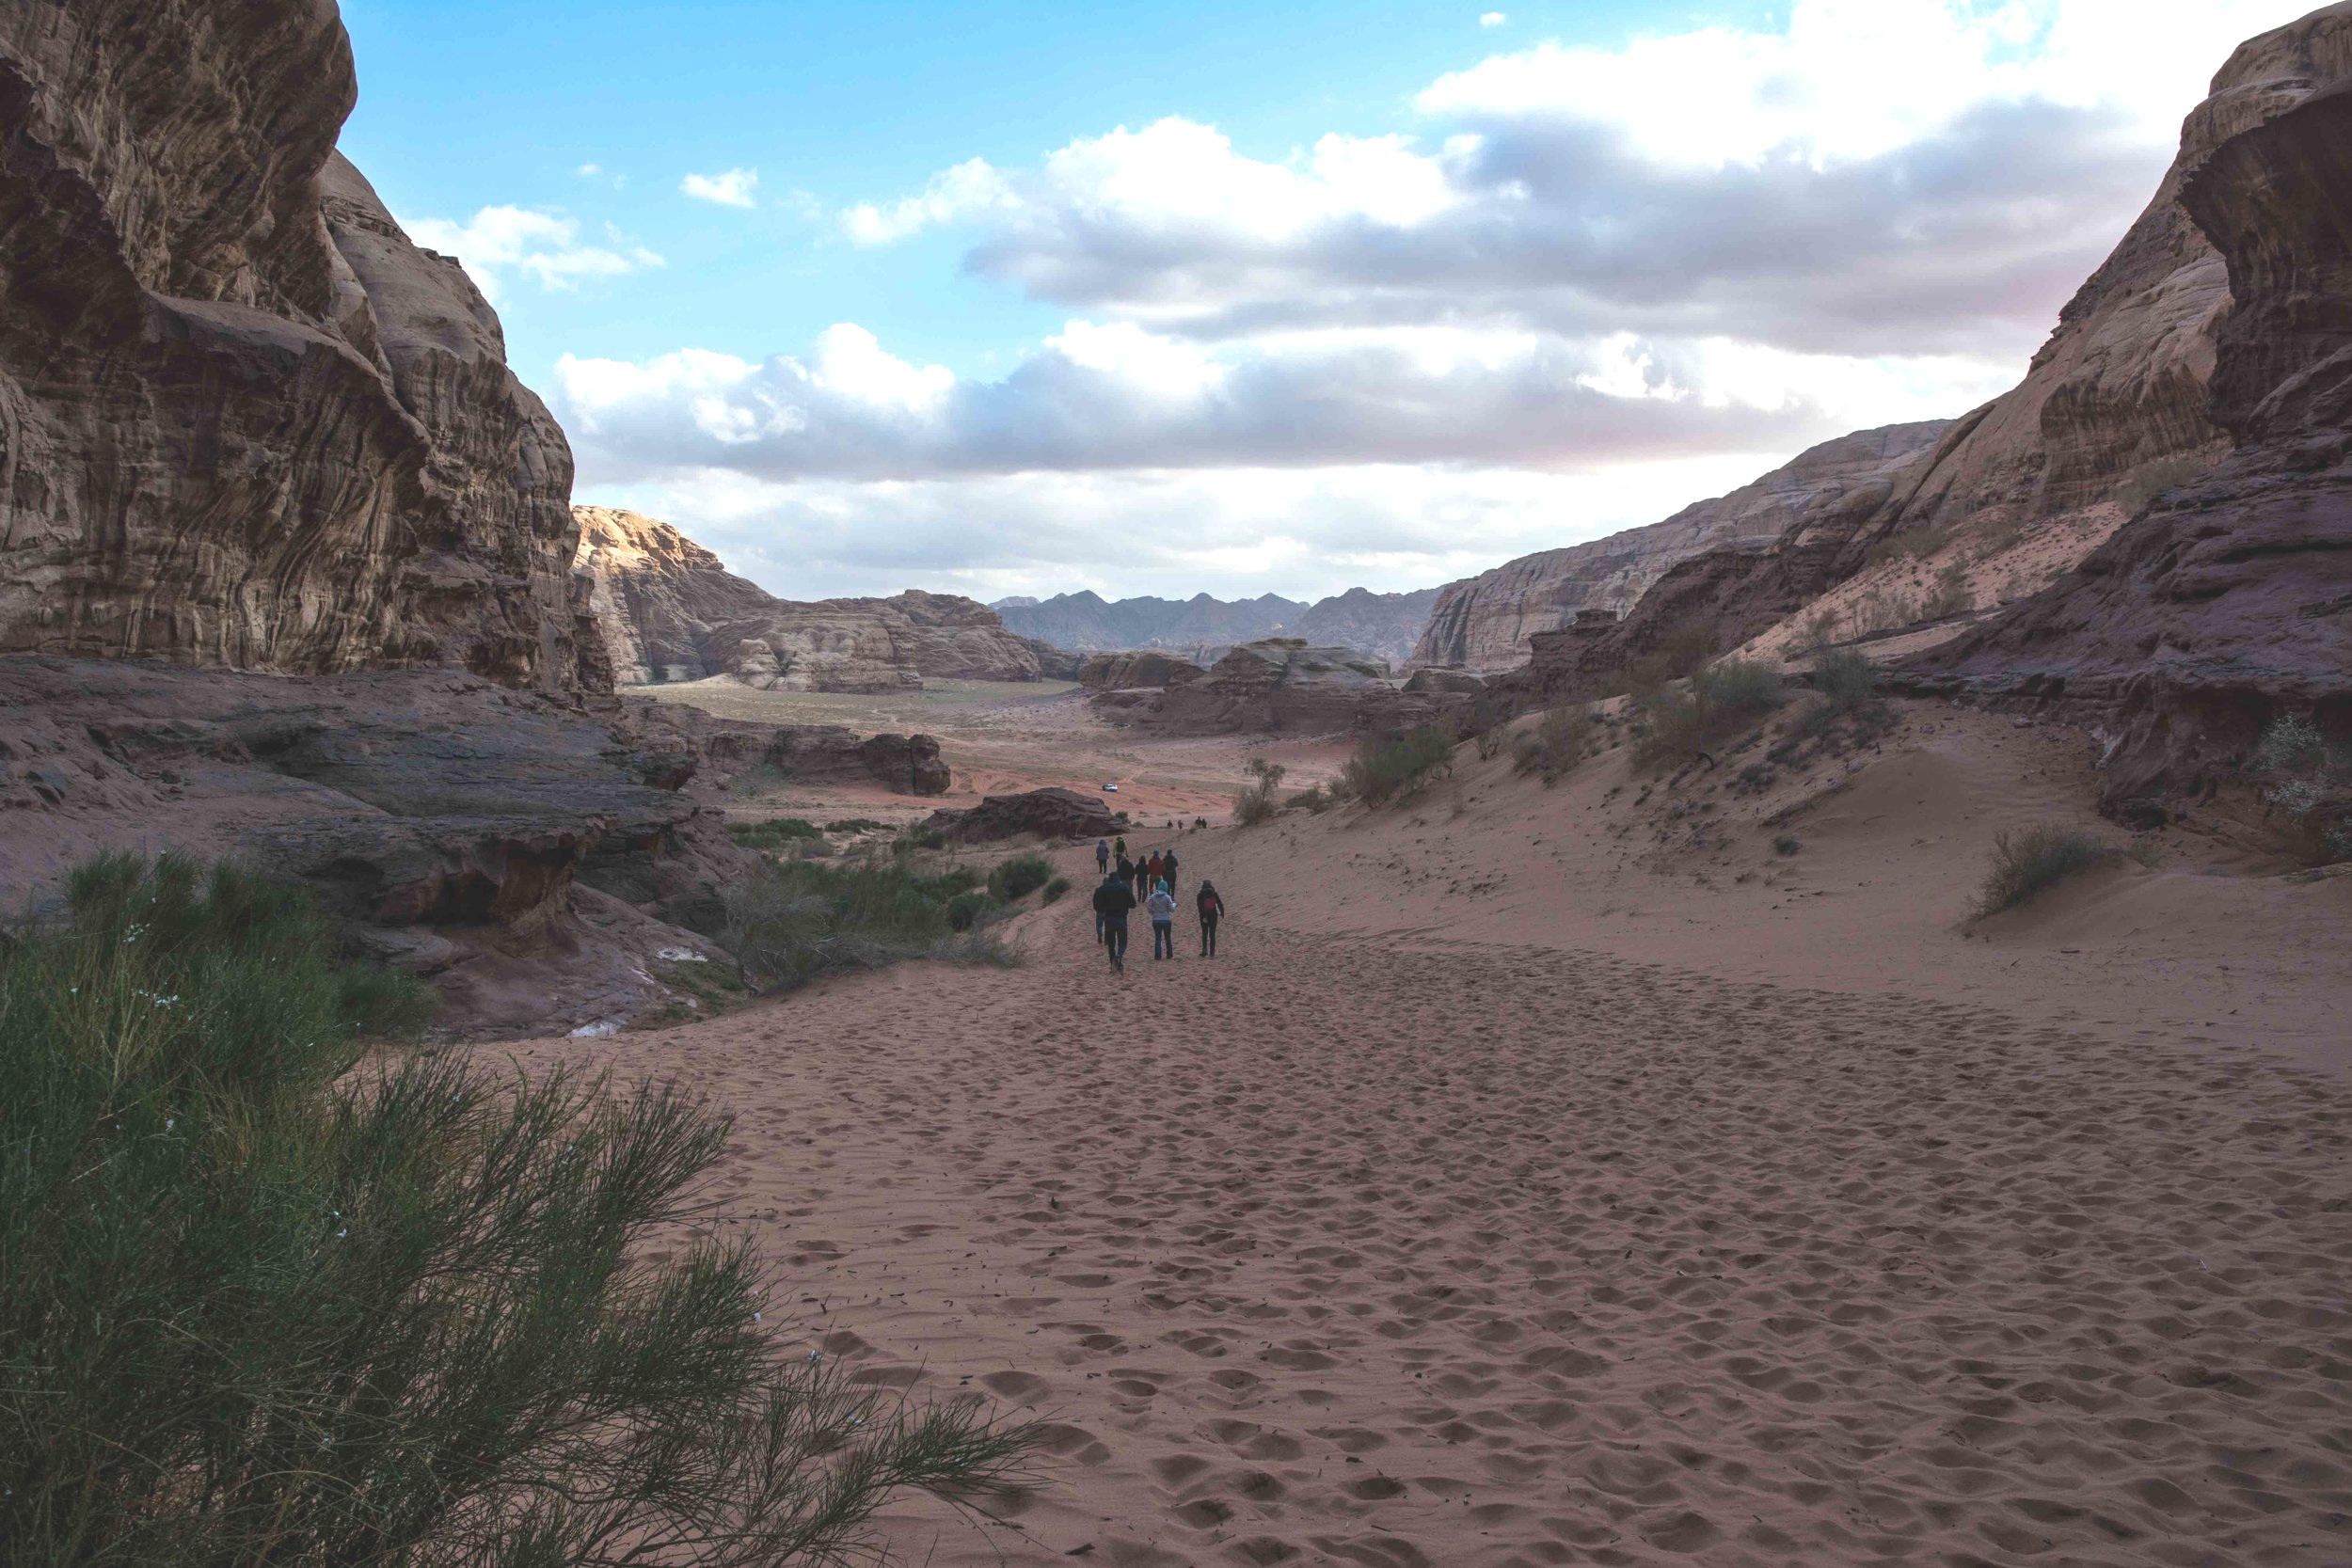 Hiking in Canyons in Wadi Rum Jordan